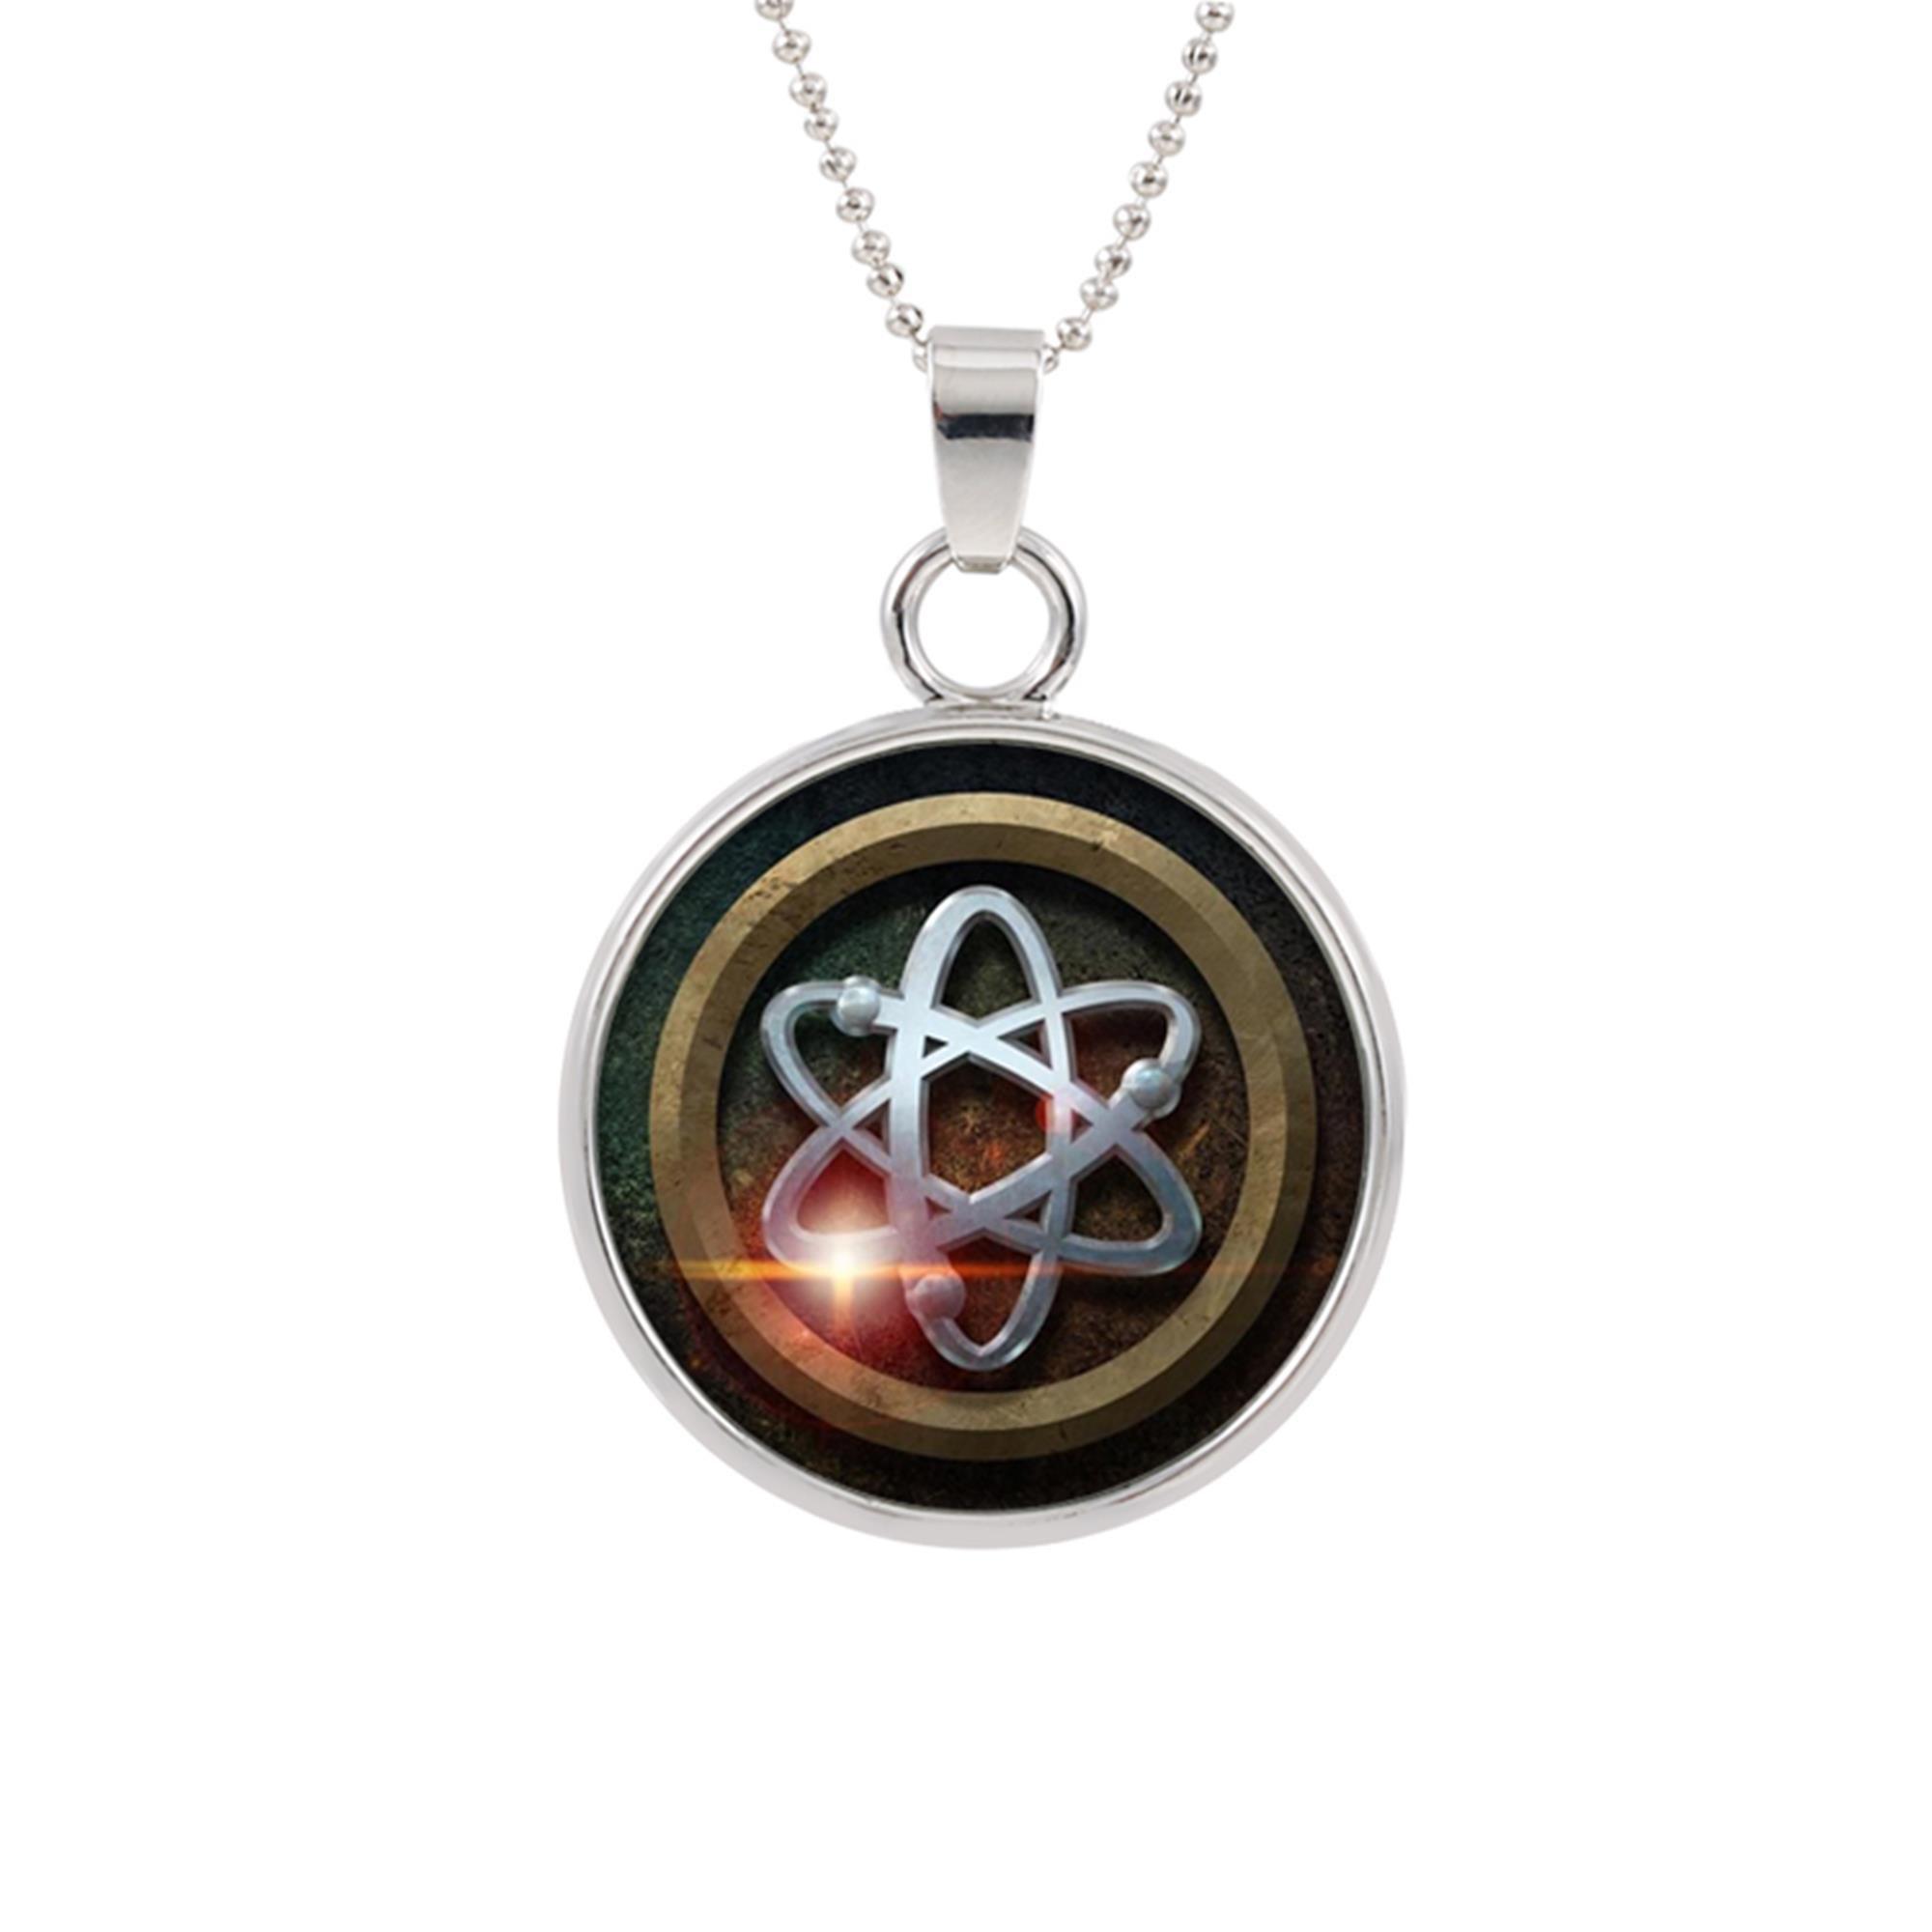 Outlander Brand Legends of Tomorrow Atom Cosplay Premium Quality 18'' Pendant Necklace w/Gift Box DC Comics